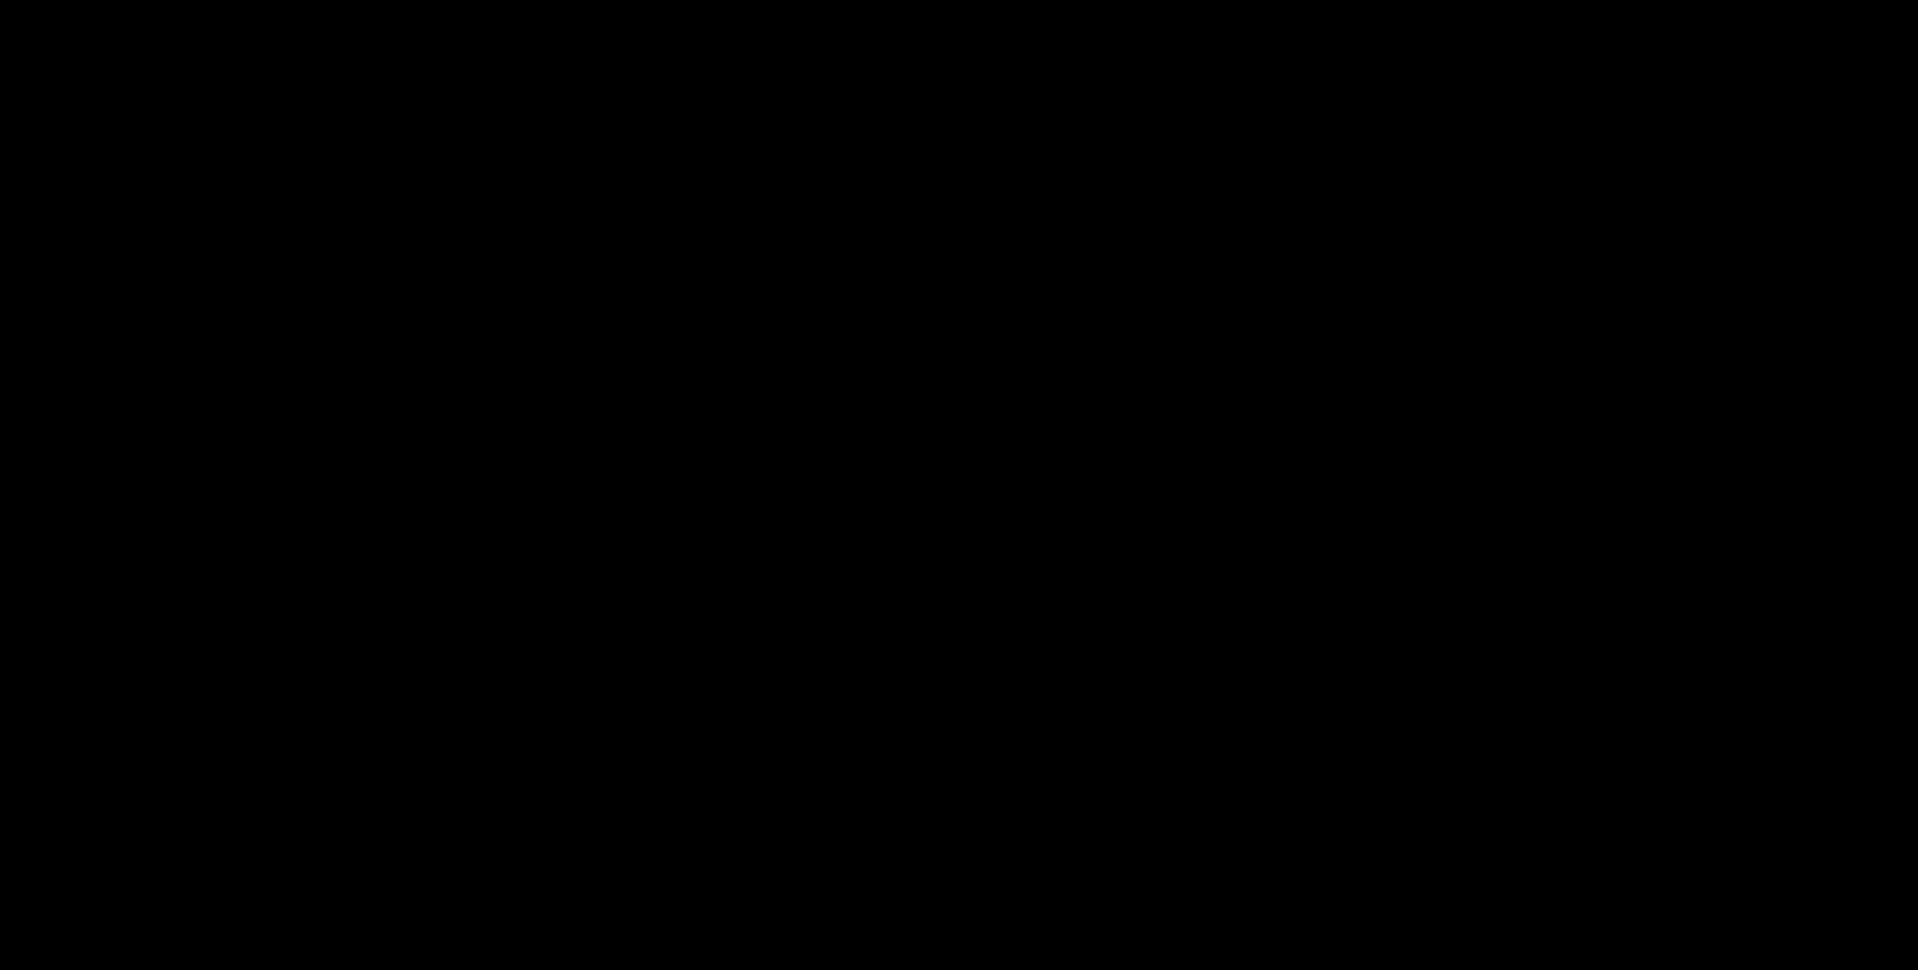 L-Valganciclovir-d<sub>5</sub> hydrochloride